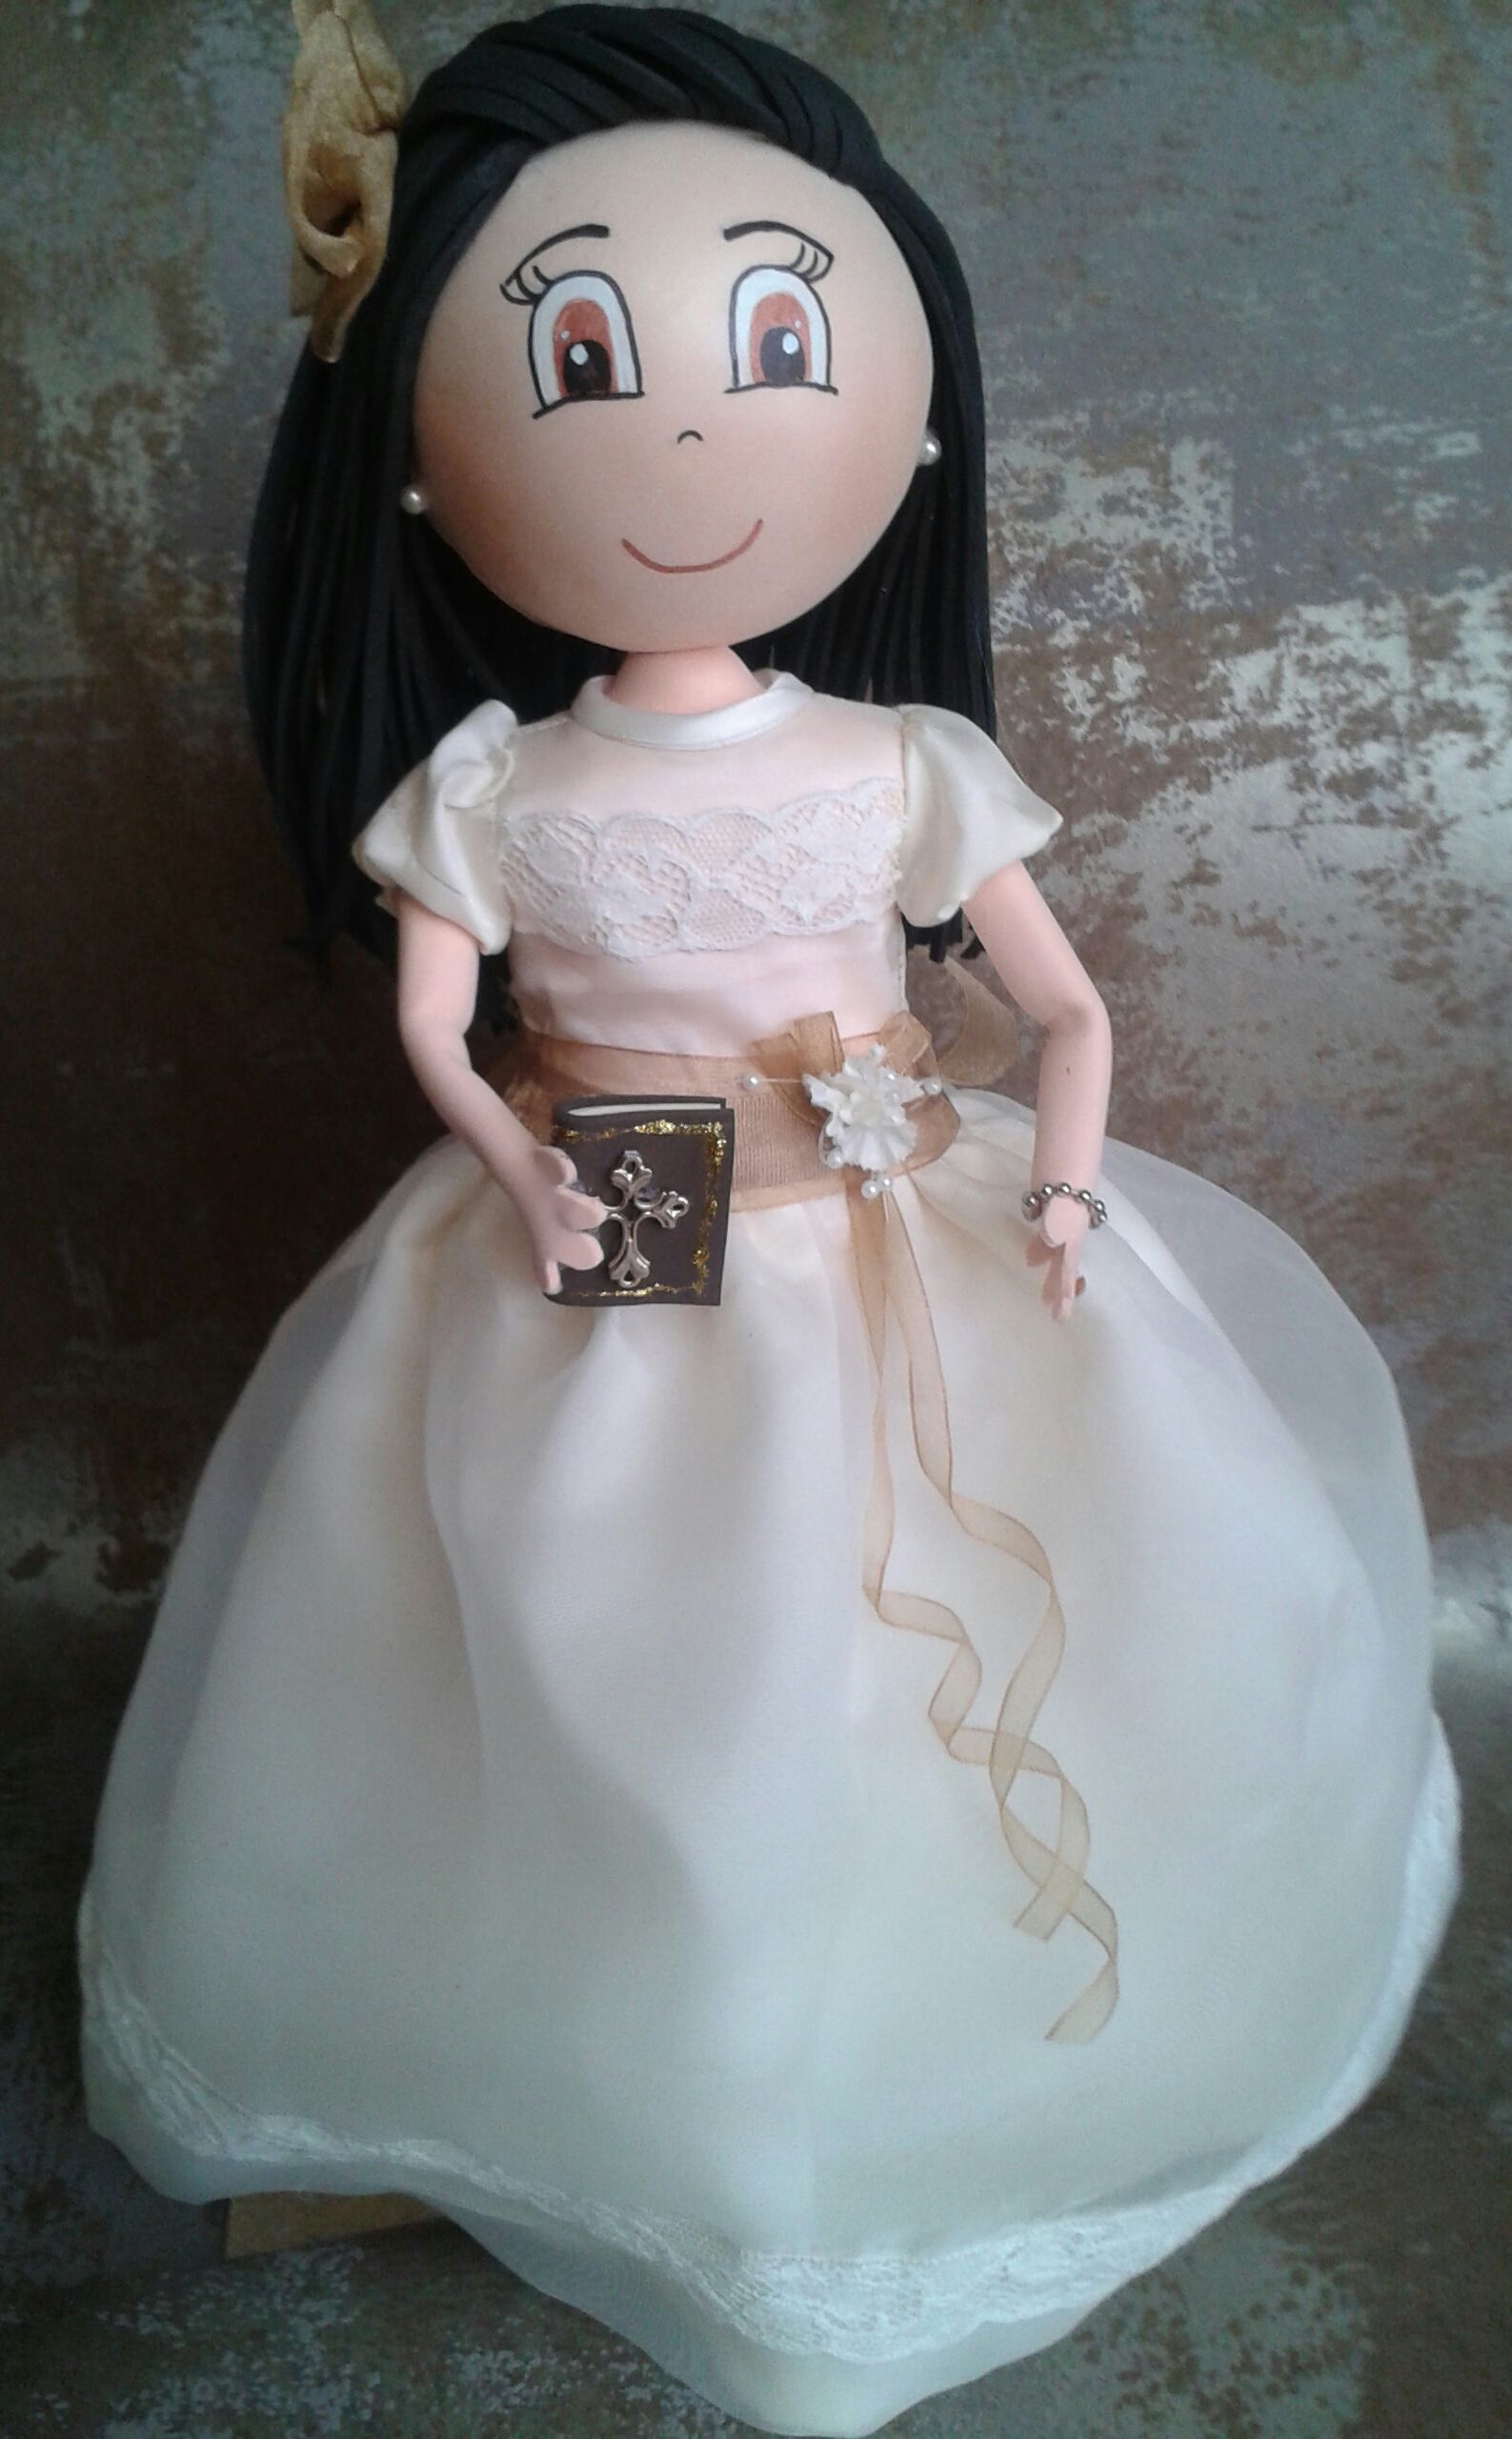 muñeca de comunion.Artesania y Manualidades Mariana